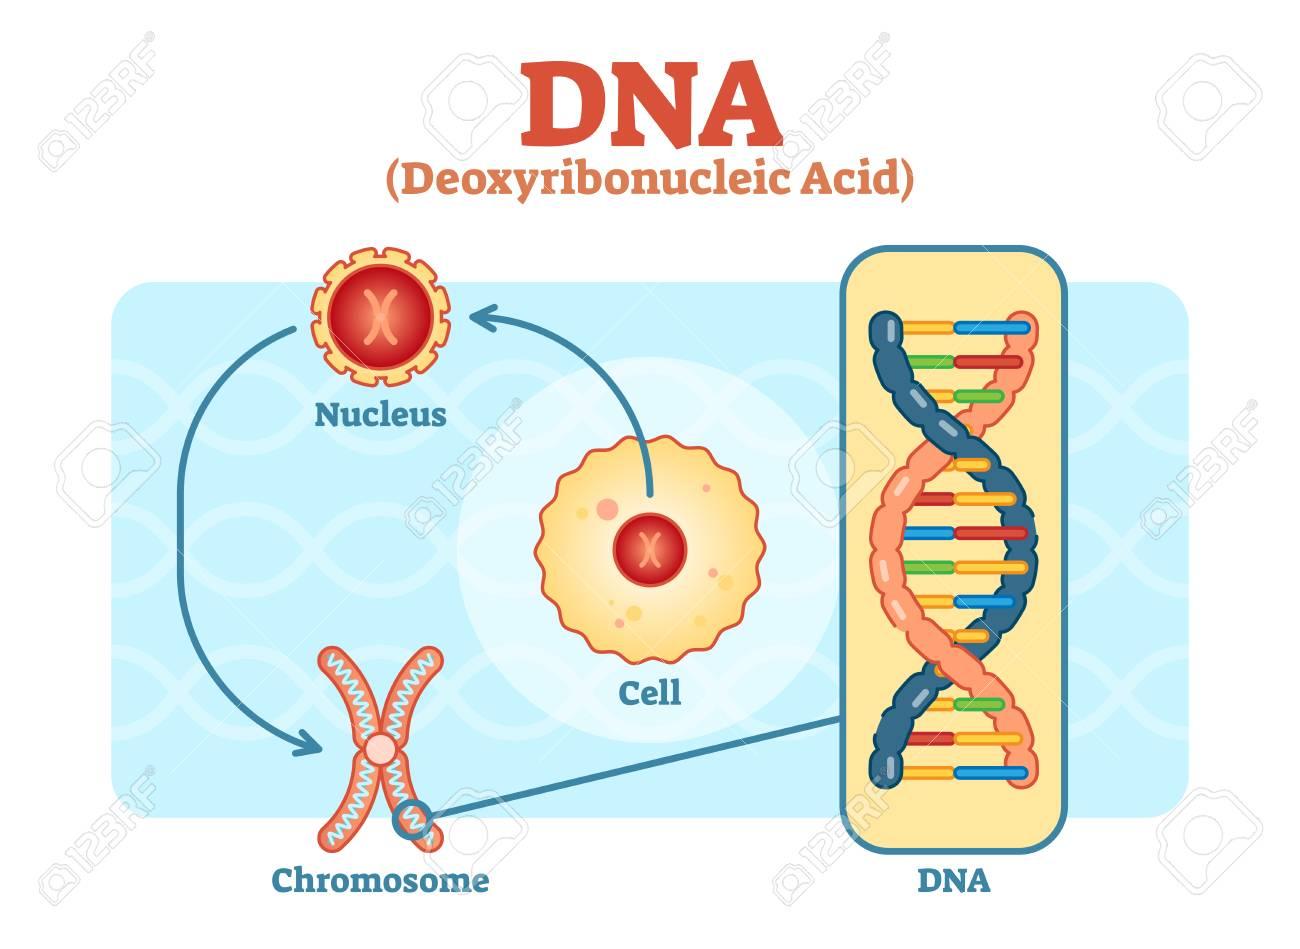 hight resolution of cell nucleus chromosome dna medical vector scheme diagram illustration stock vector